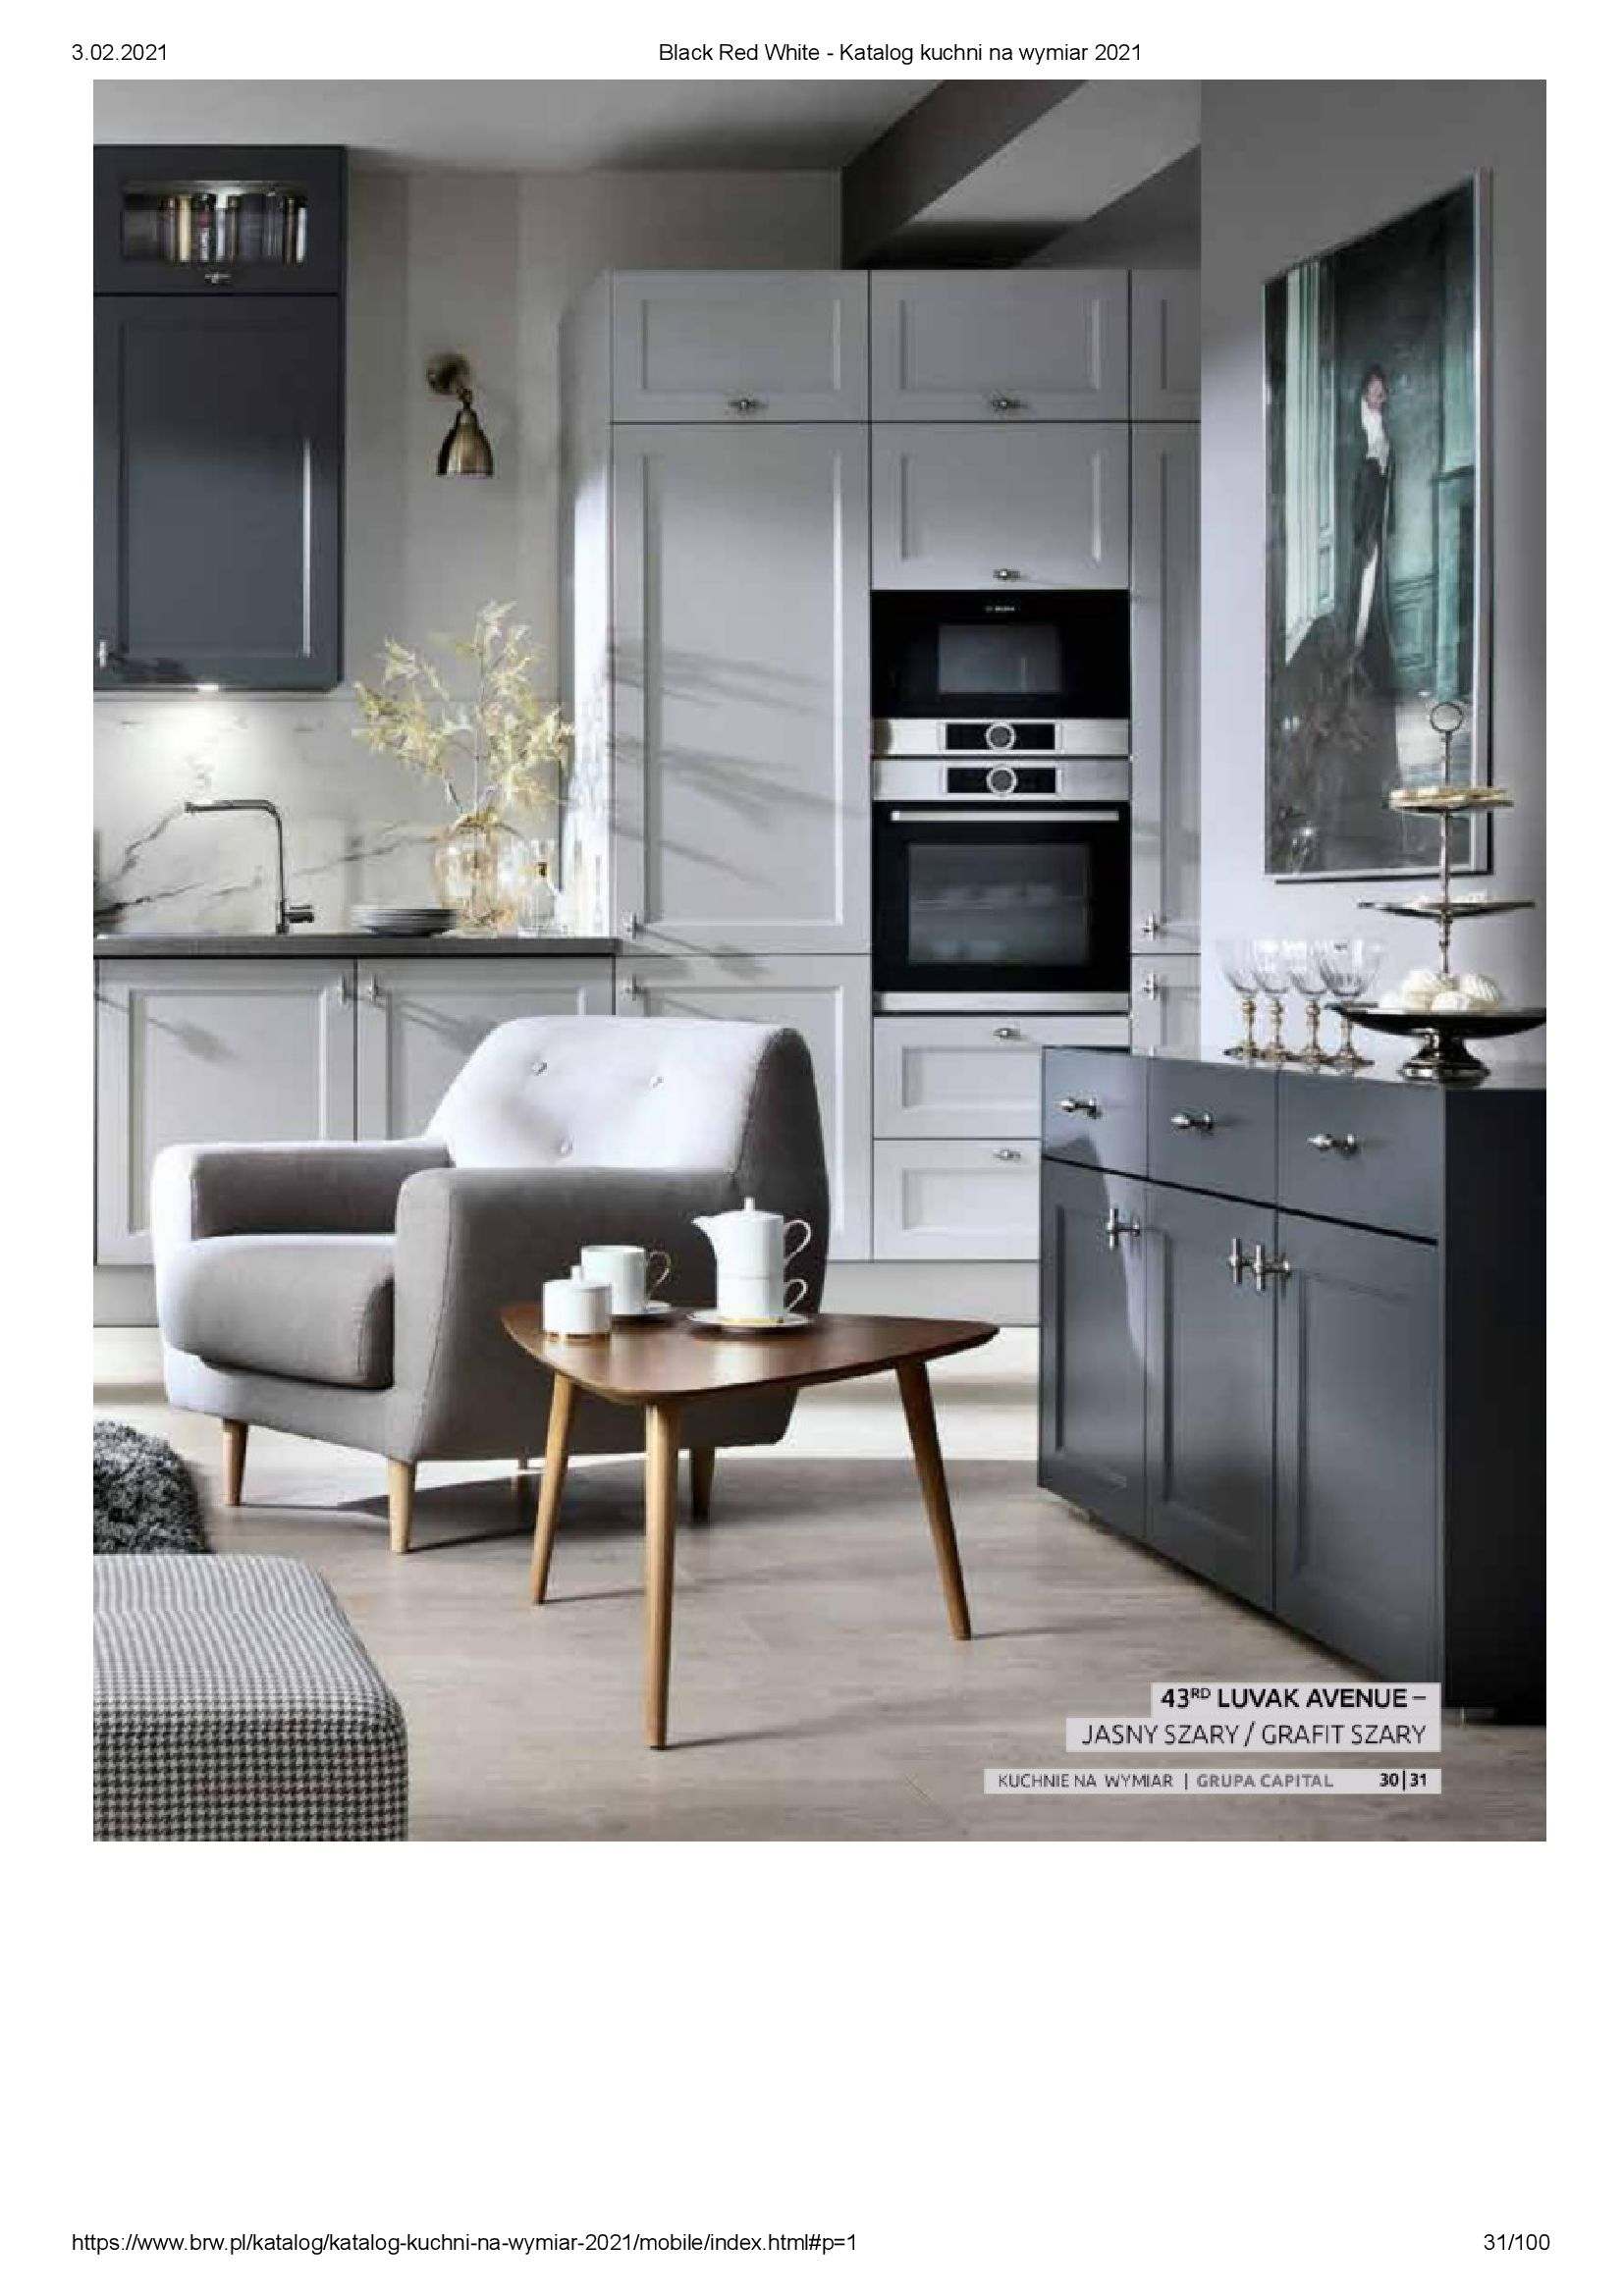 Gazetka Black Red White: Katalog - Kuchnie na wymiar Senso Kitchens 2021 2021-01-01 page-31